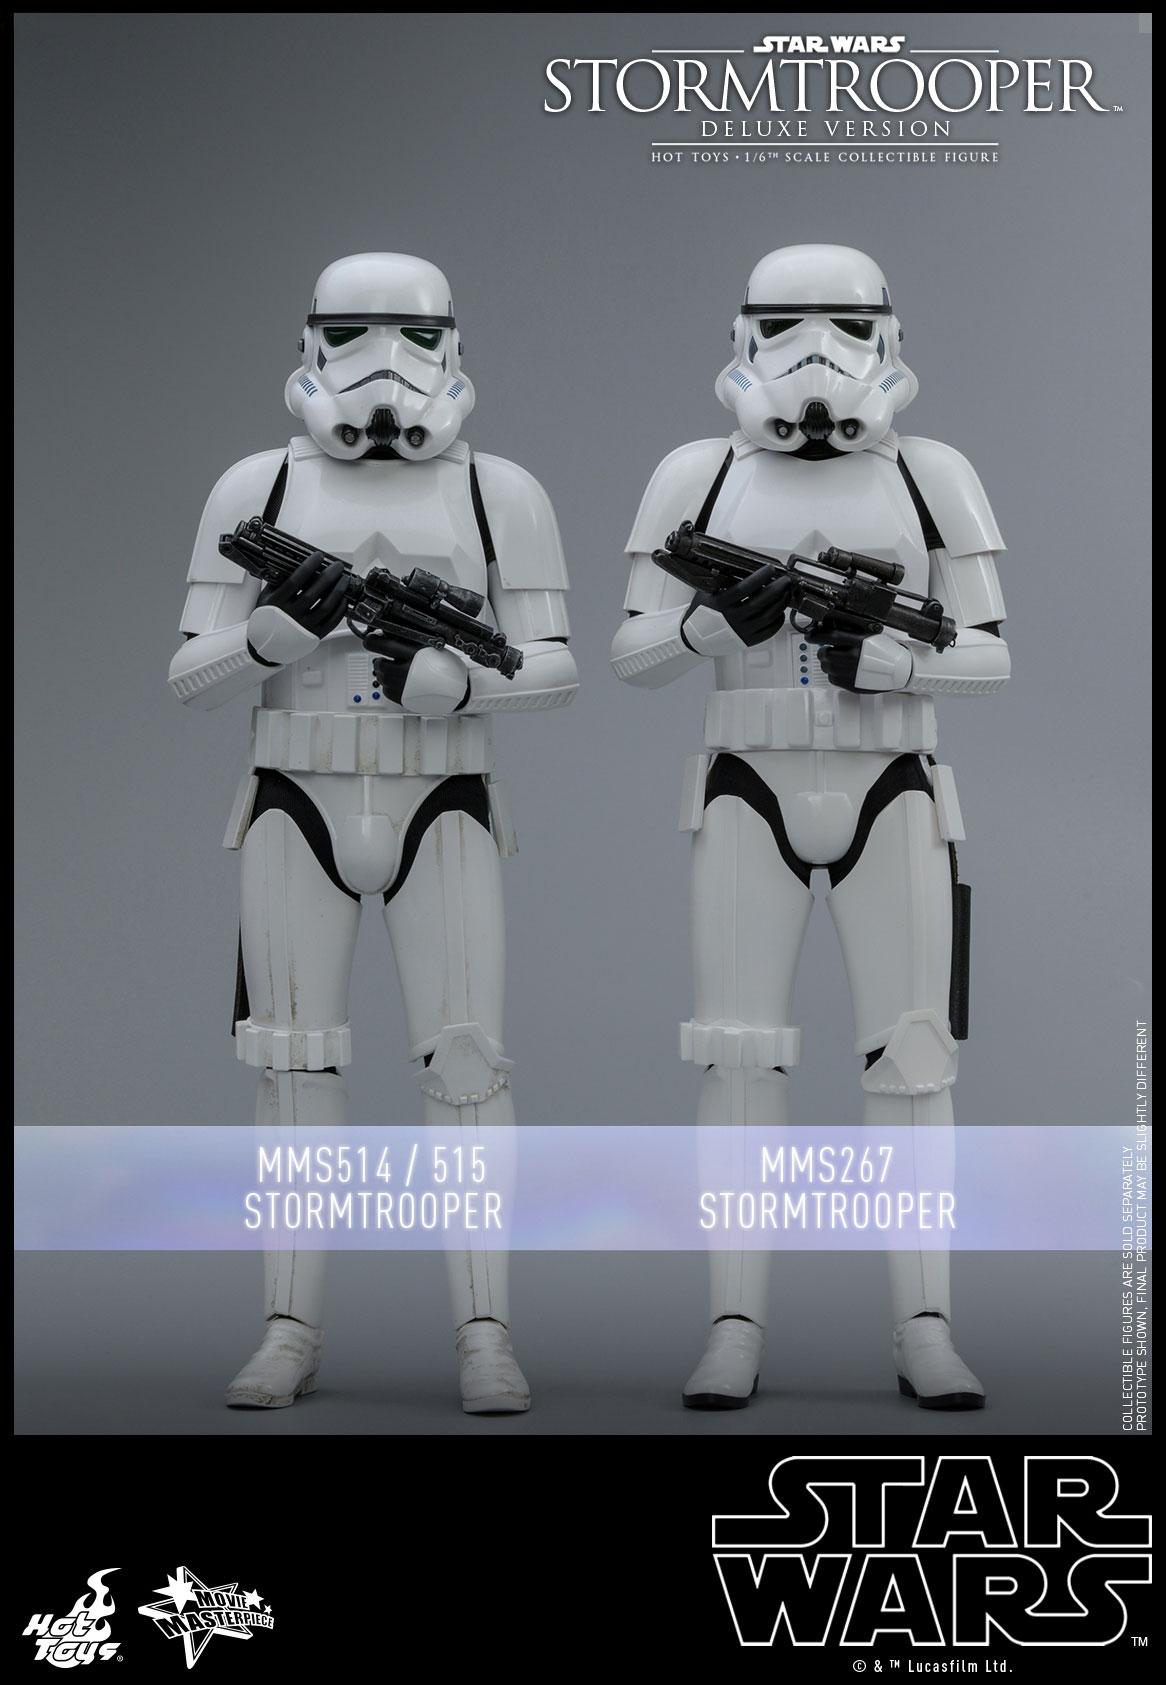 Hot-Toys---Star-Wars---Stormtrooper-Collectible-Figure-(Deluxe-Version)_PR5